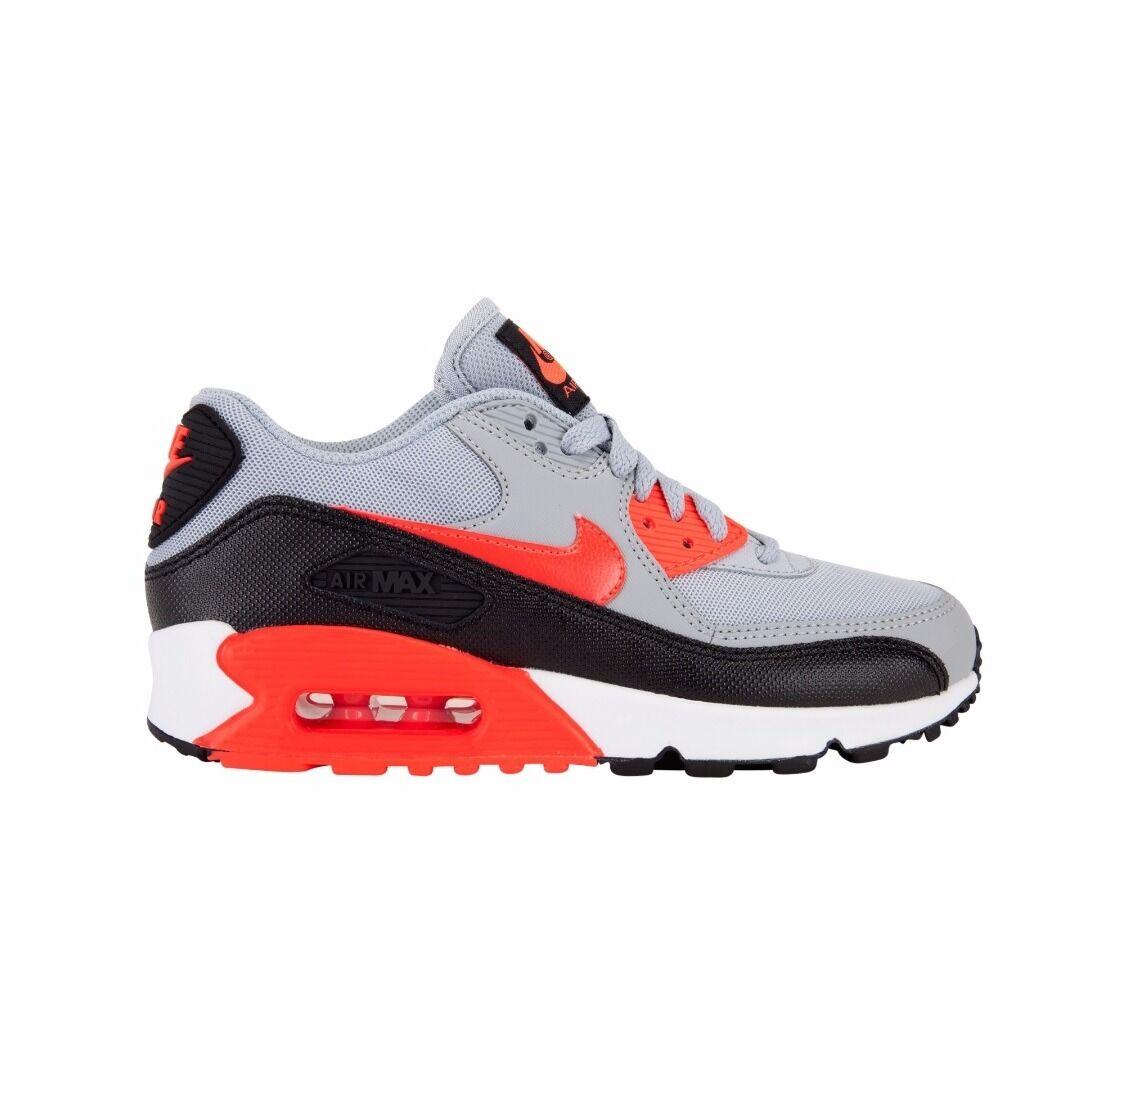 NIKE Damenschuhe AIR MAX 90 ESSENTIAL WOLF GREY RUNNING  TRAINERS Schuhe GYM  RUNNING /- 391720